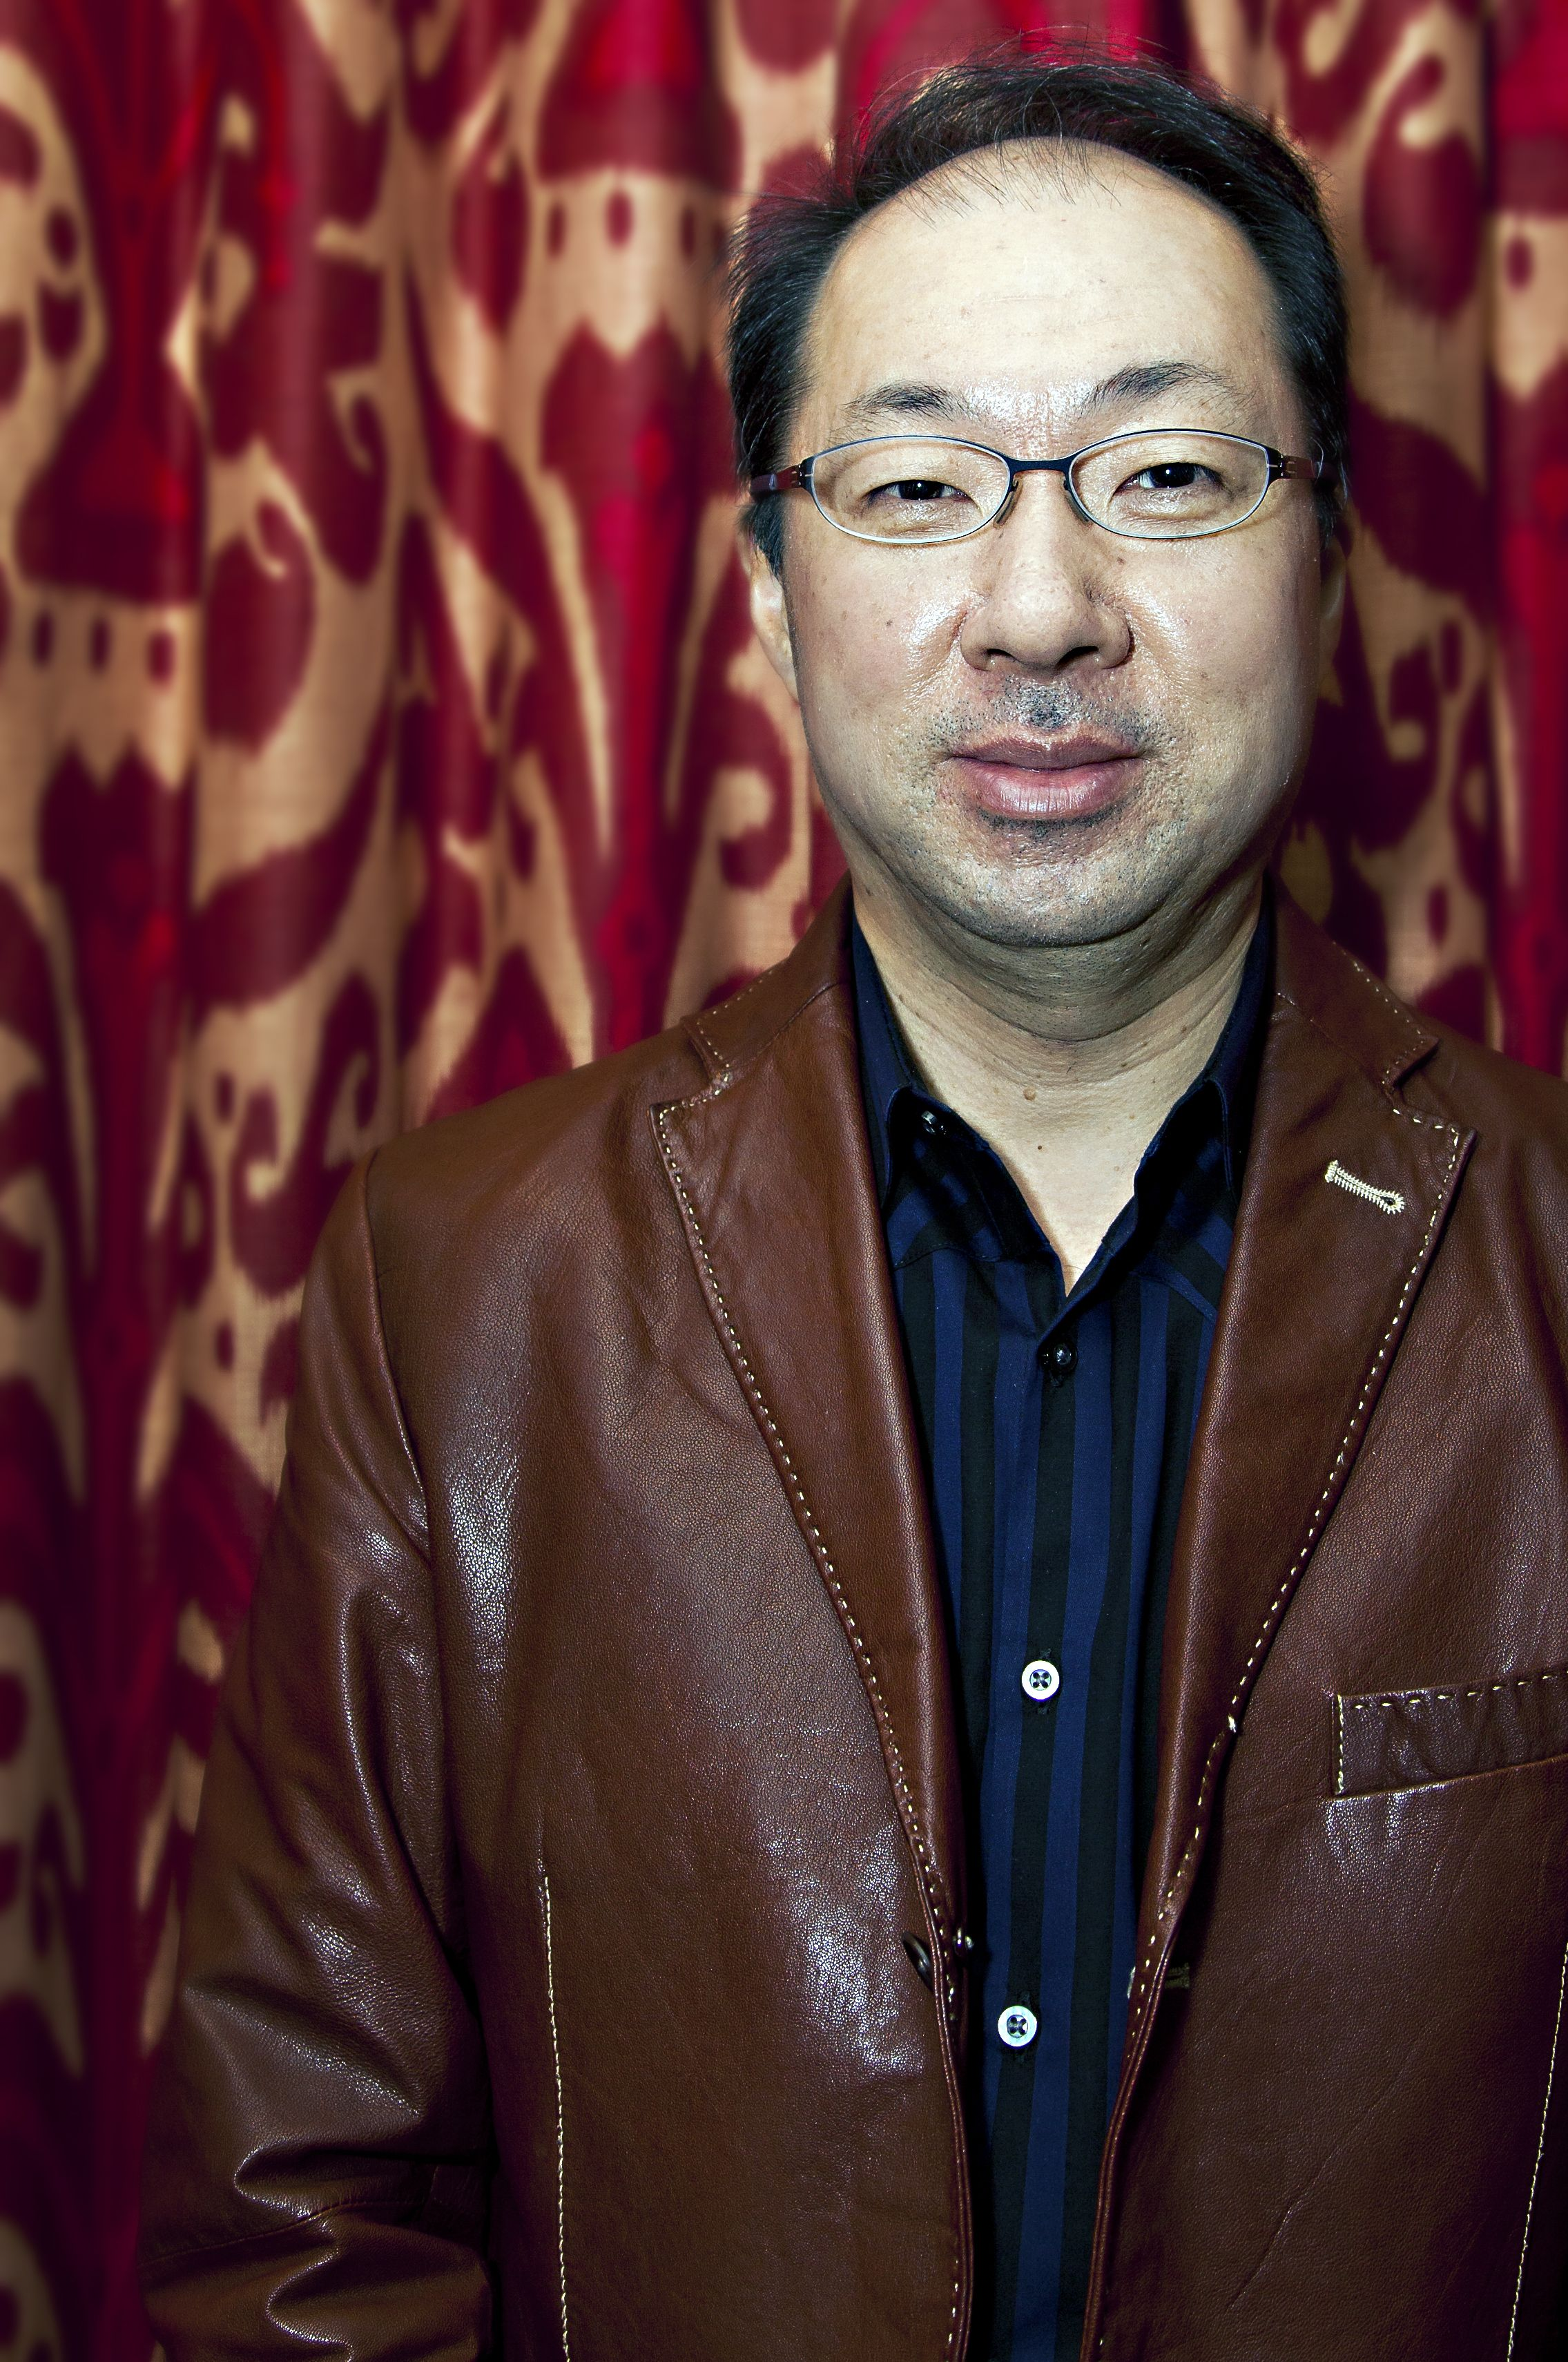 Koji Kondo (He Hasnt Done Movies, But This Man Has